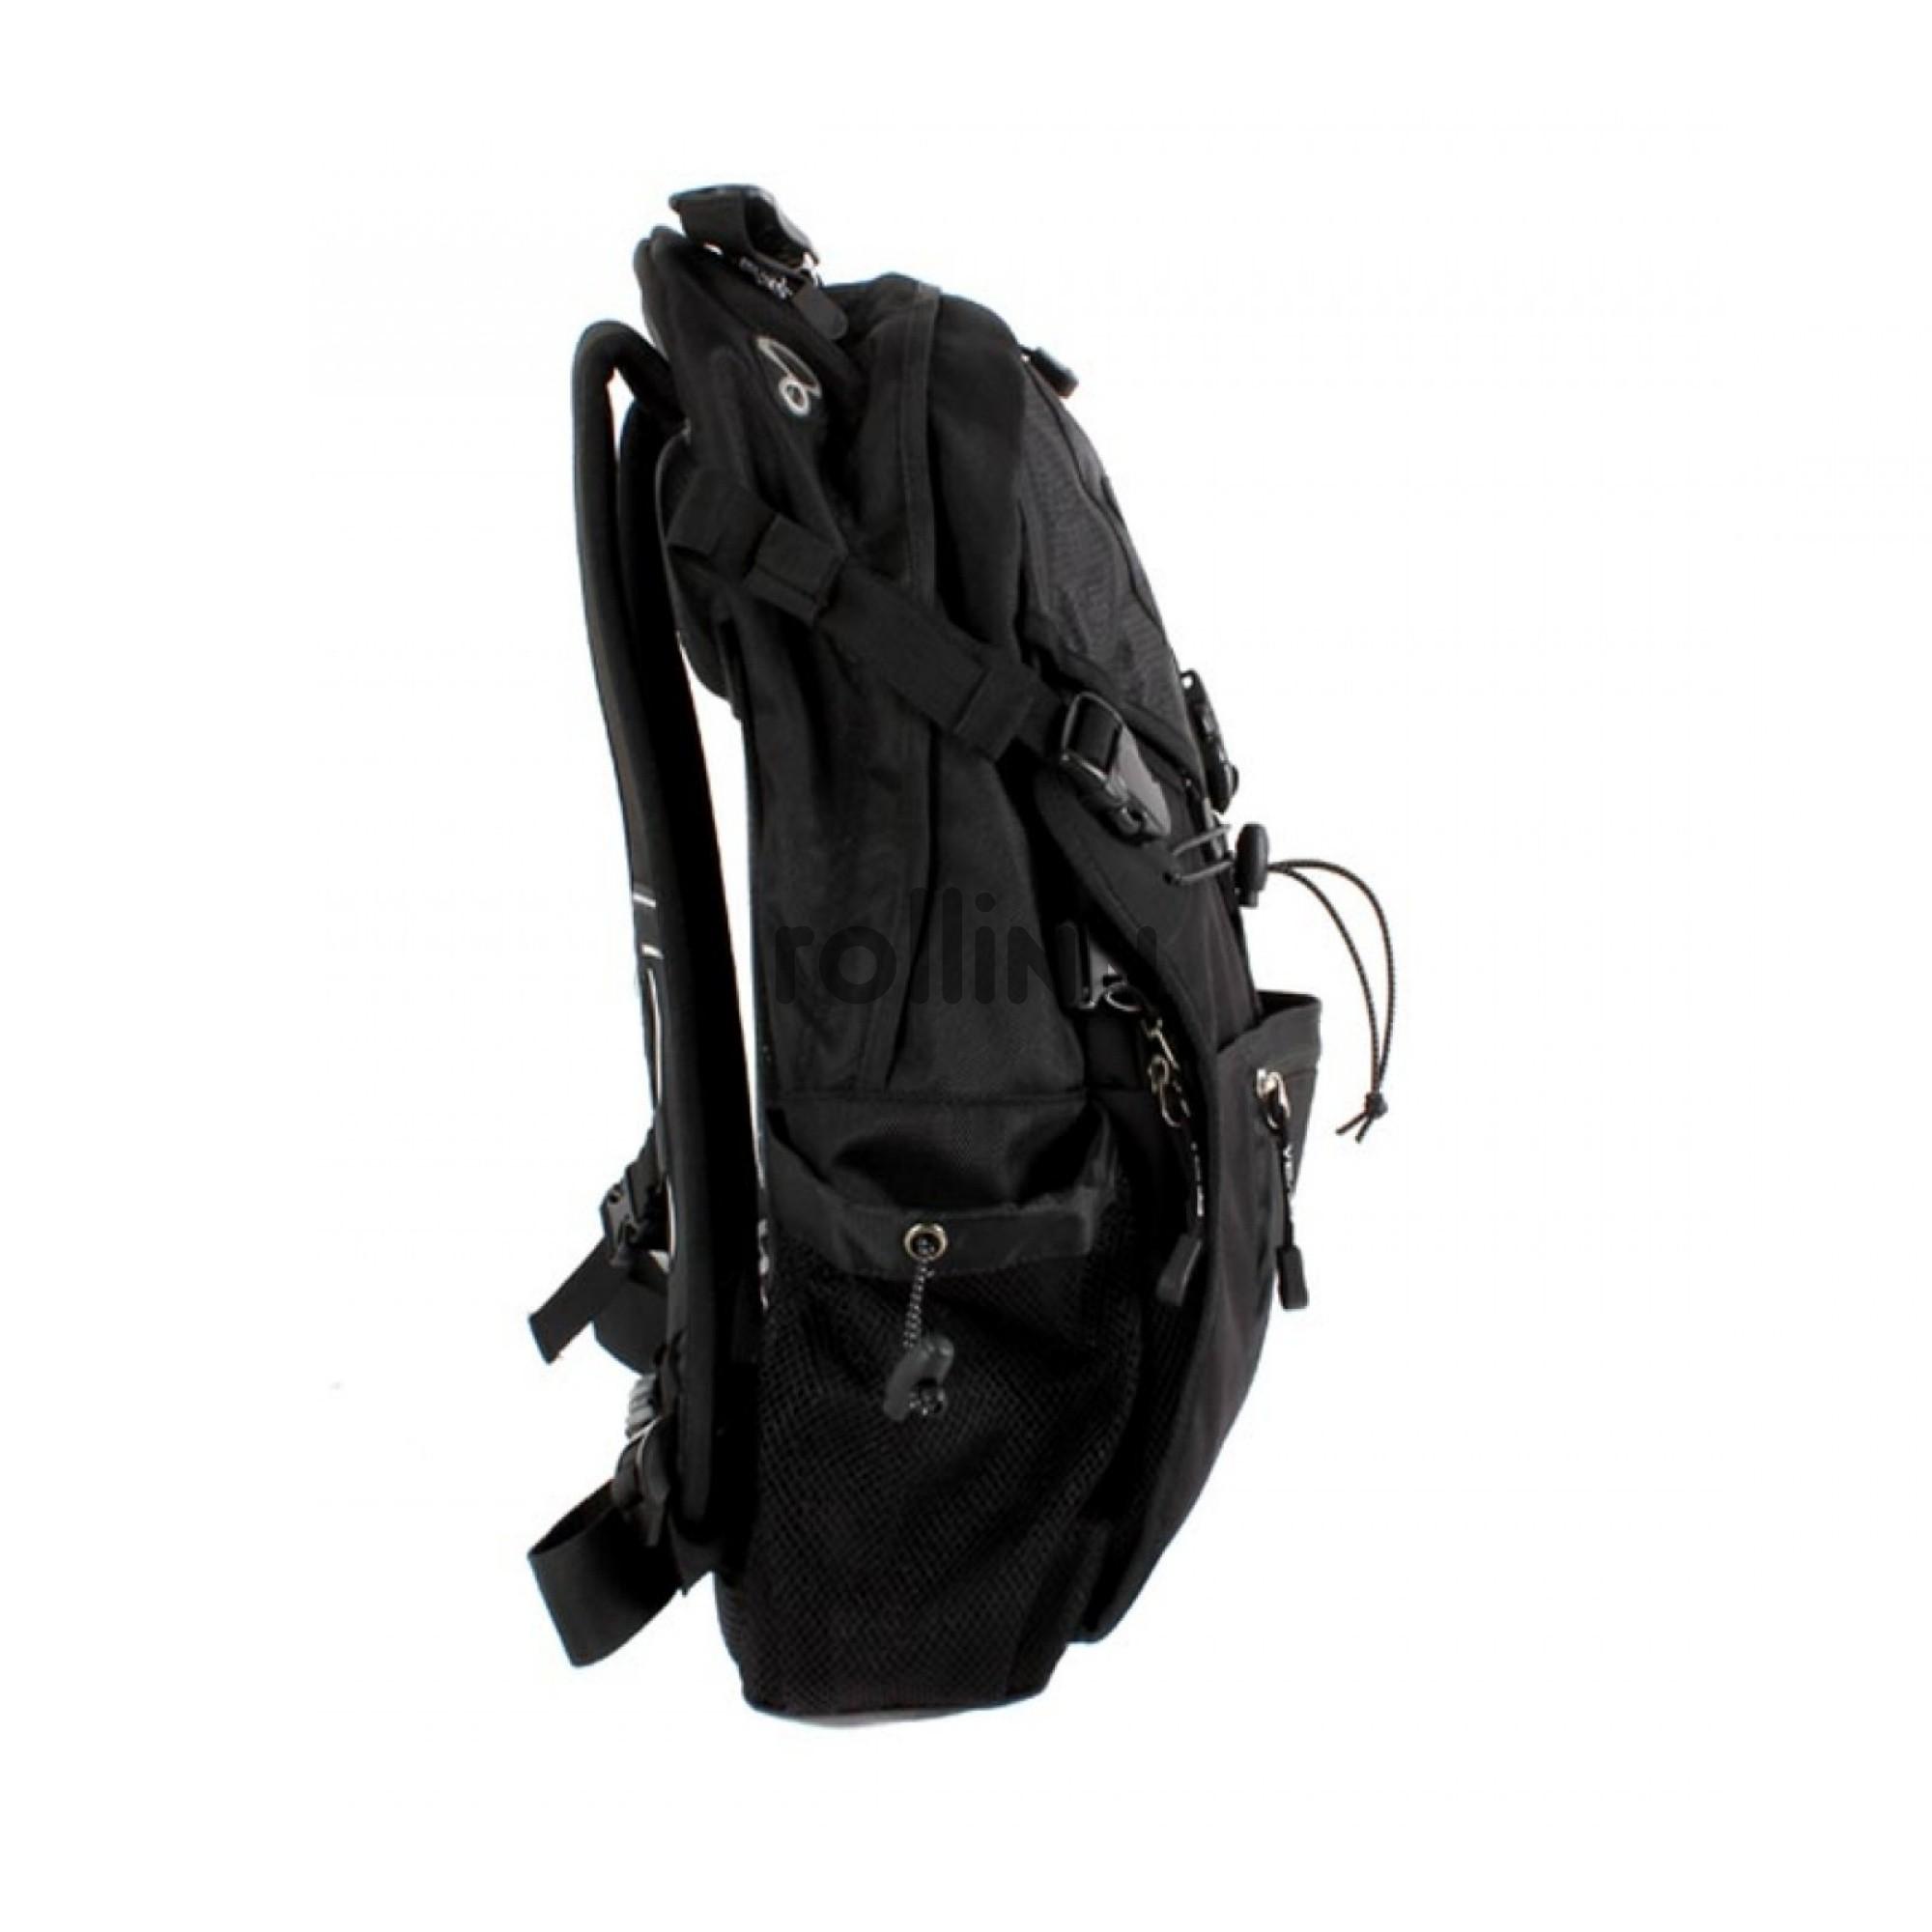 cfe02a1f71287 SEBA BACKPACK LARGE Plecak na rolki r. L DUŻY BLACK/Sklep sportowy :  Rollinn.pl - rolki, skating, ochraniacze, SEBA, Powerslide, K2, Rollerblade